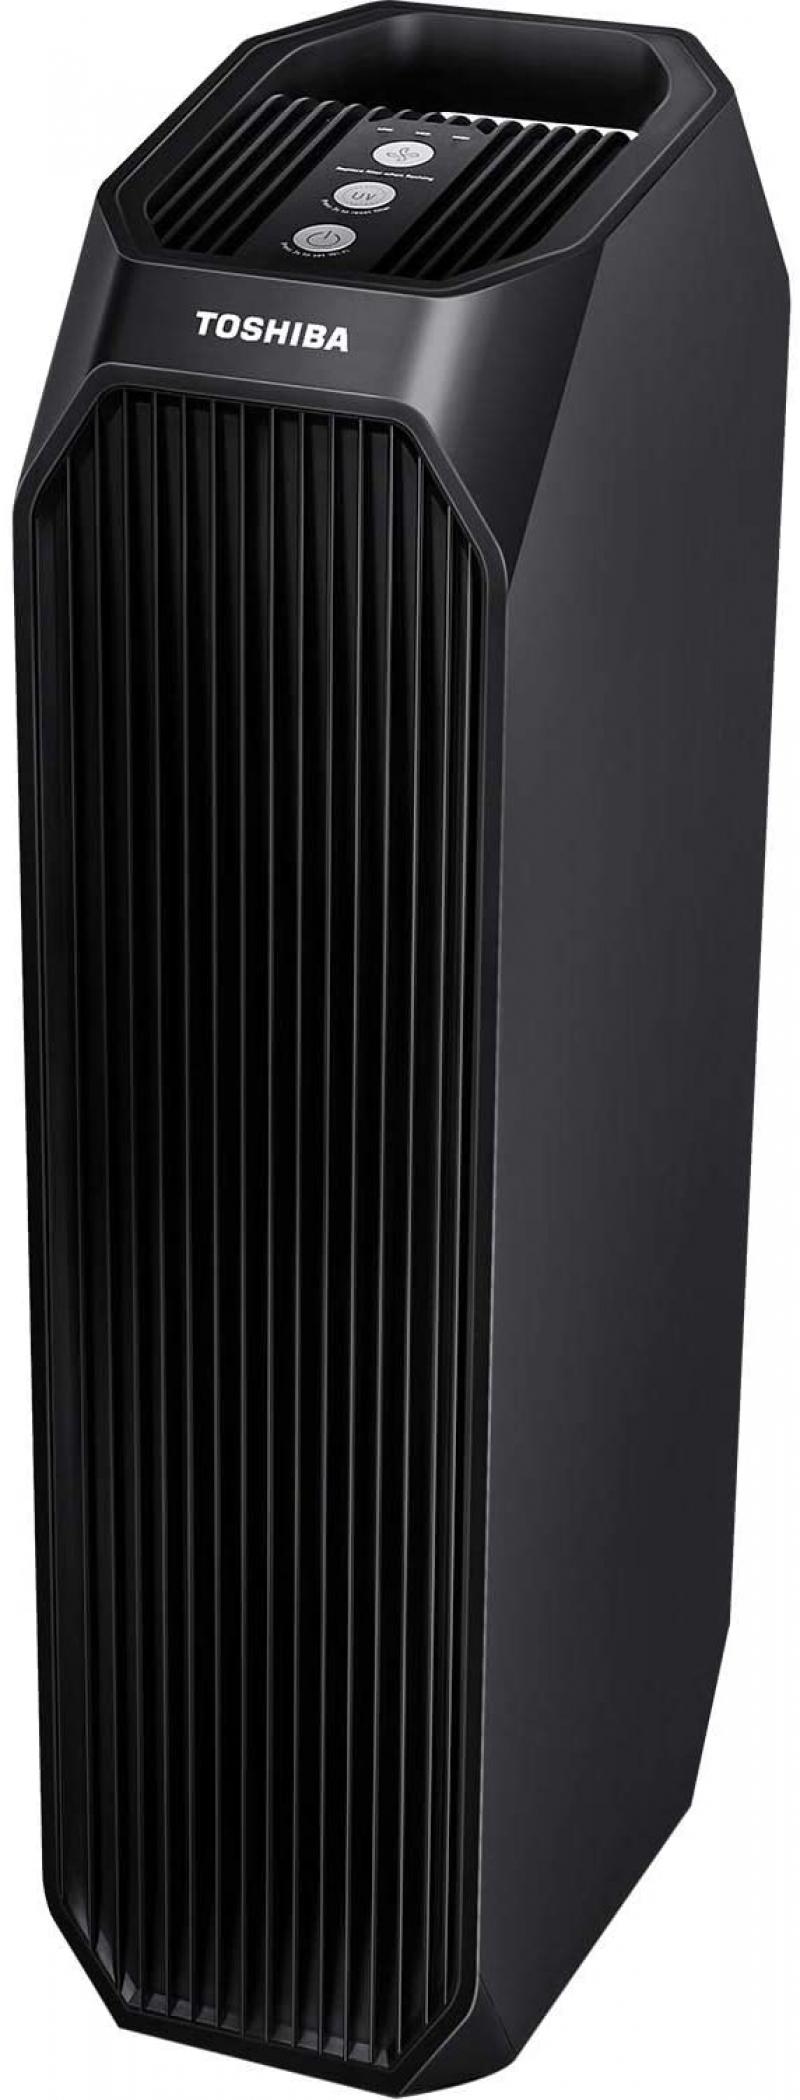 ihocon: Toshiba Smart WiFi Air Purifier, 3-in-1 True HEPA Air Cleaner 智能空氣清淨機/空氣淨化器